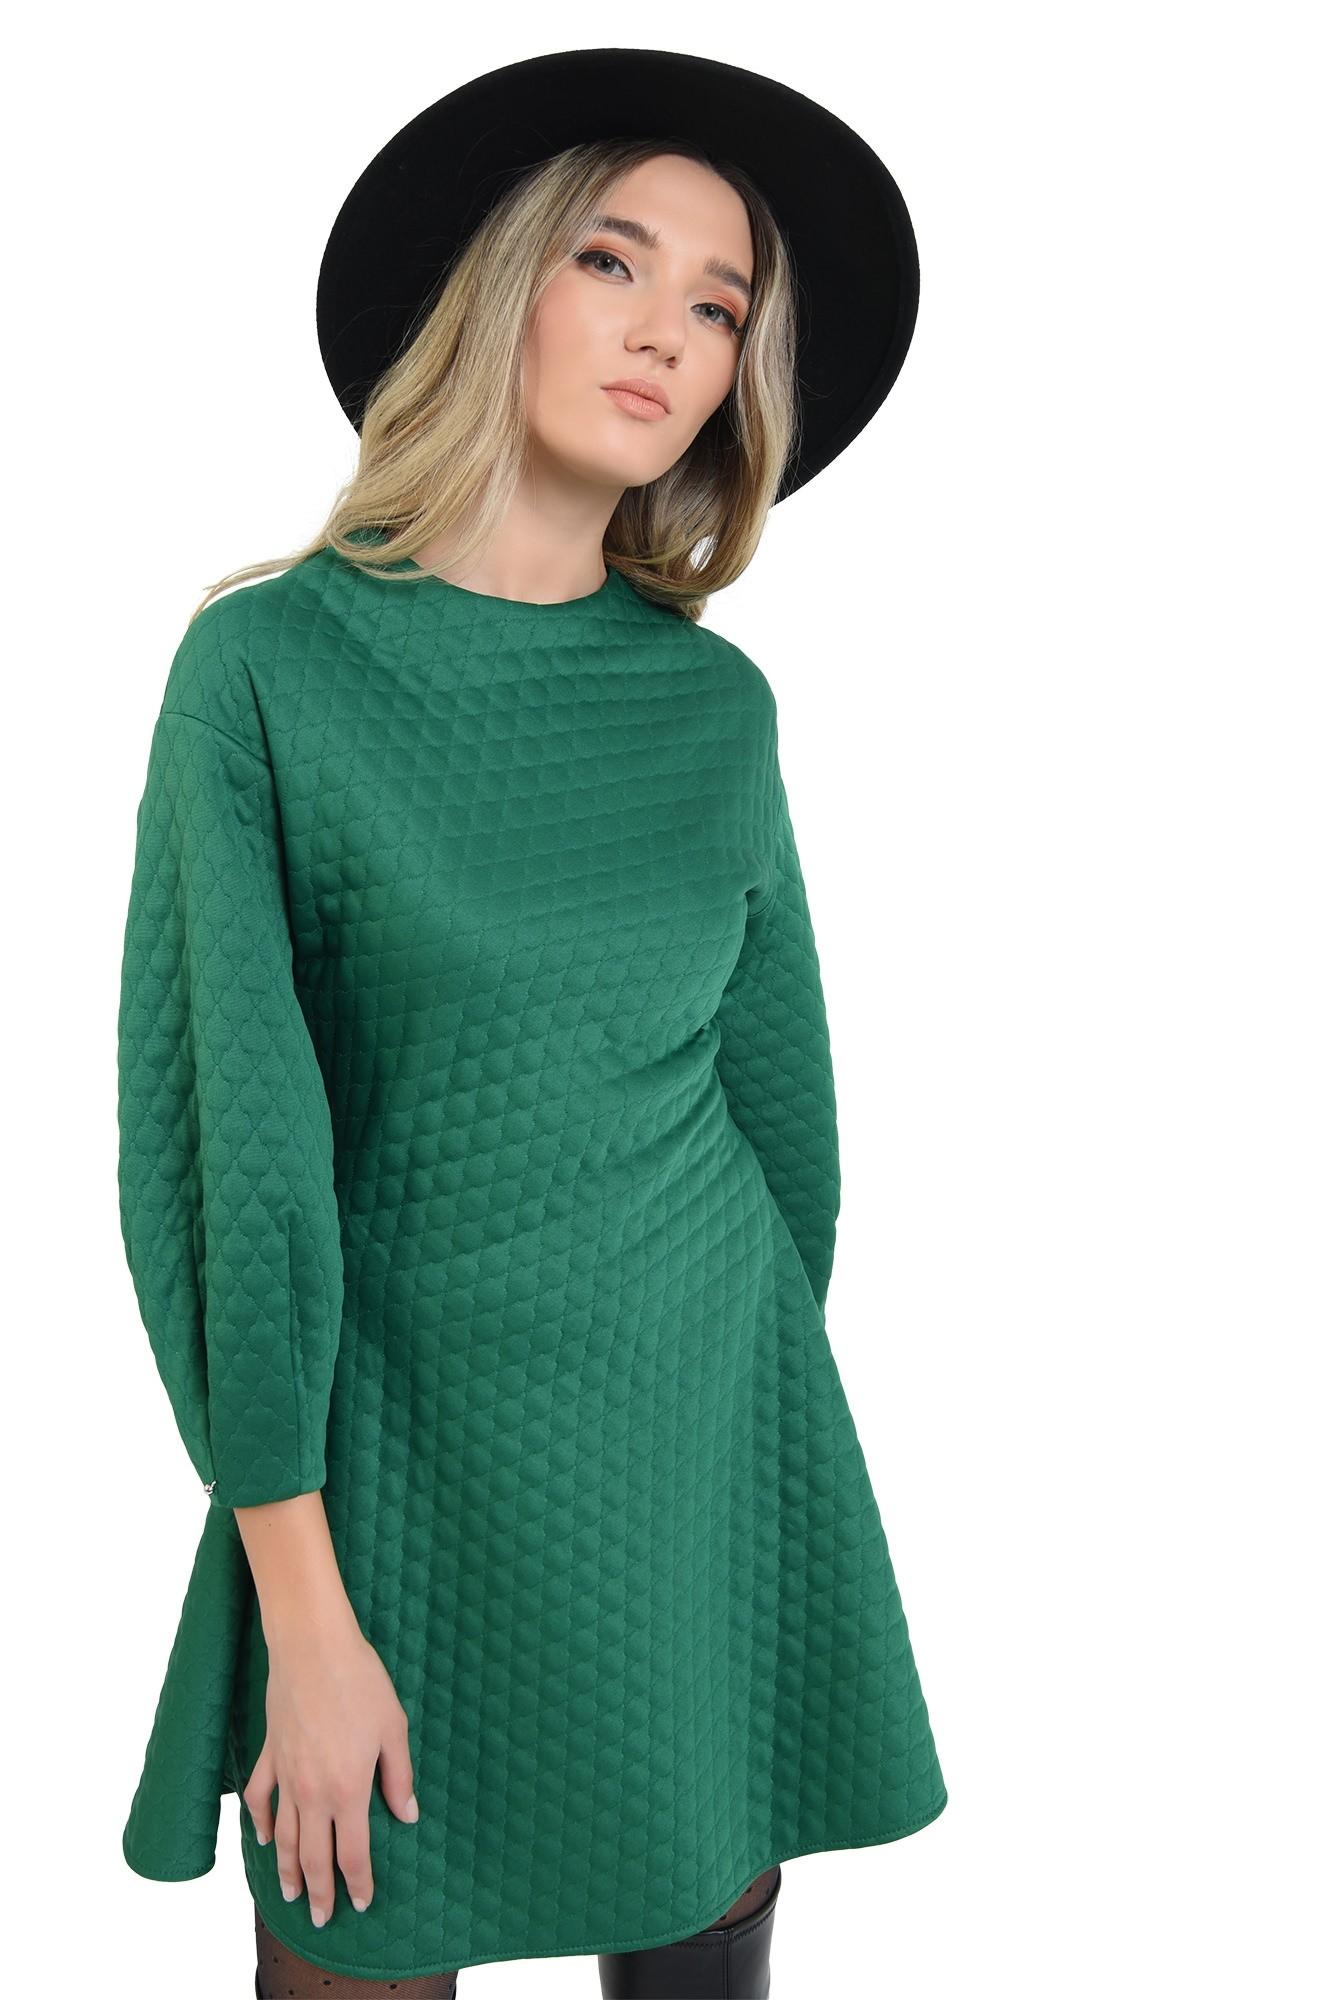 3 - rochie din material matlasat, verde, scurta, evazata